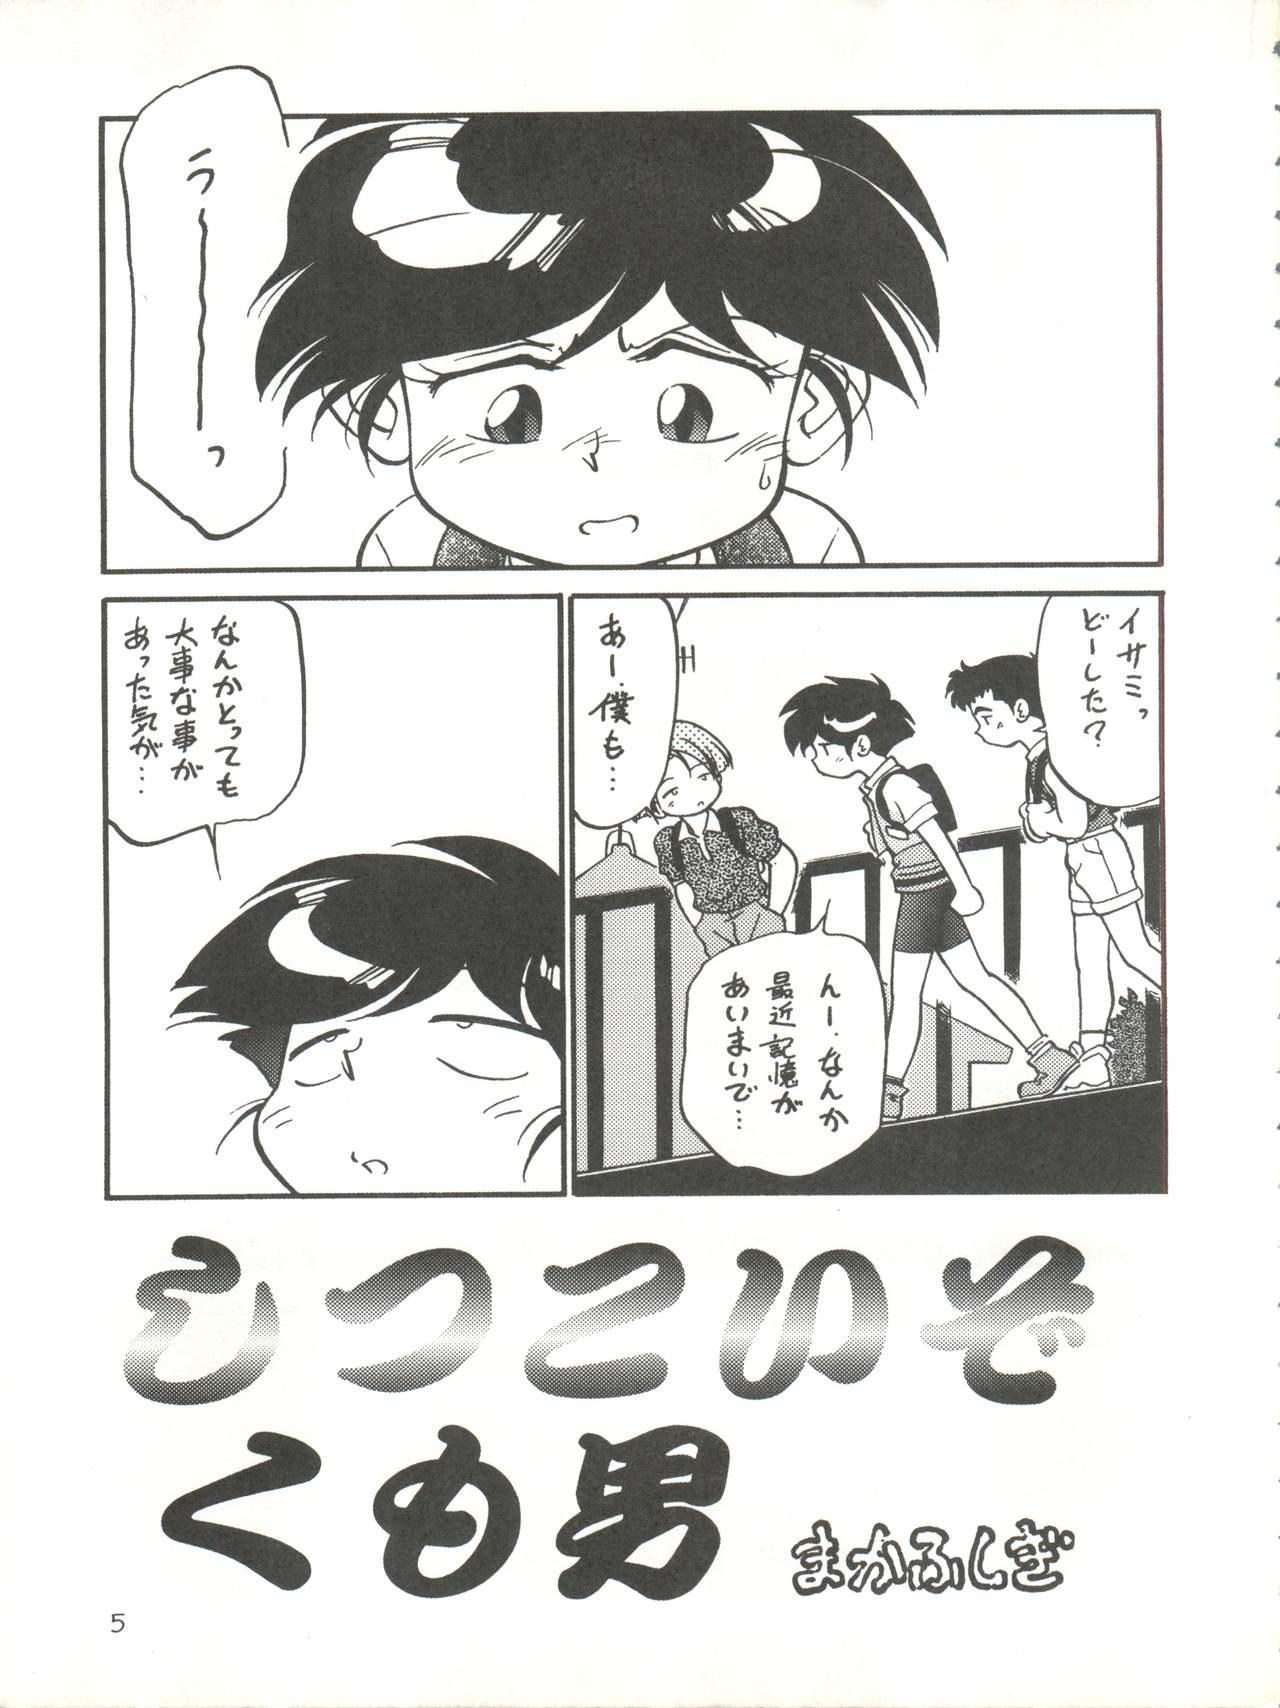 Kaiketsu Spats 4